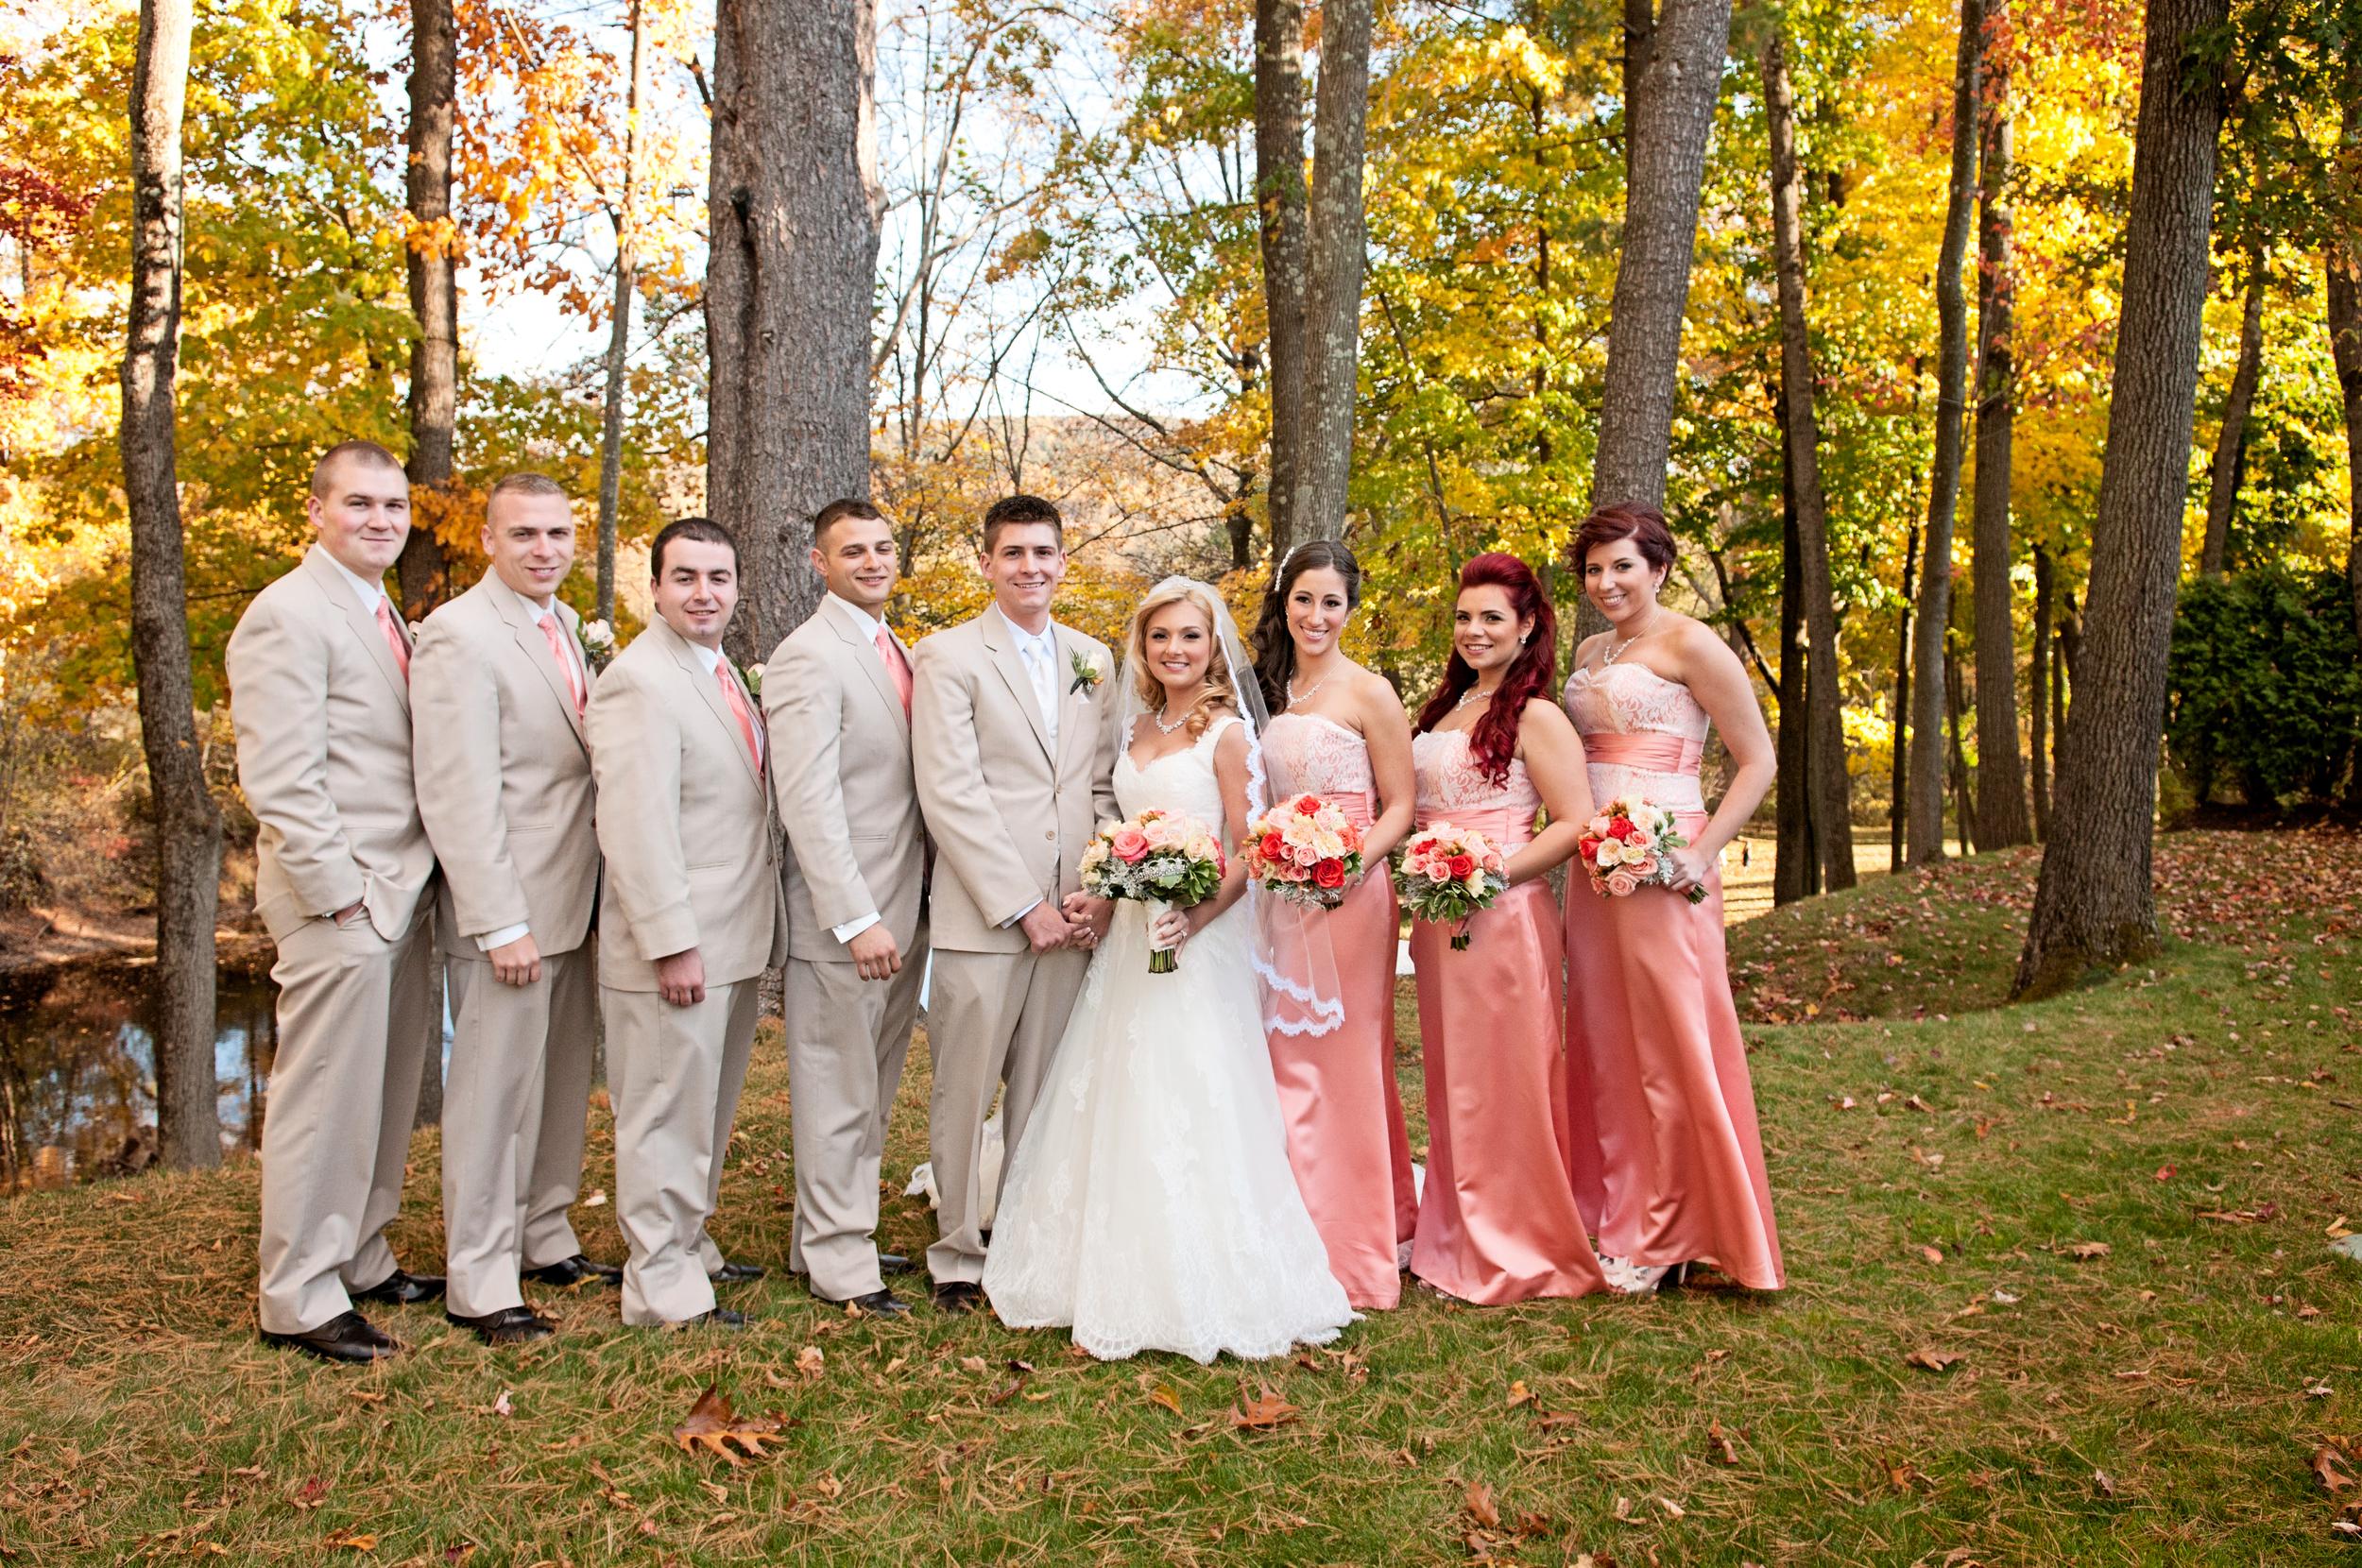 Angela_Chicoski_CT_wedding_photographer_080.jpg